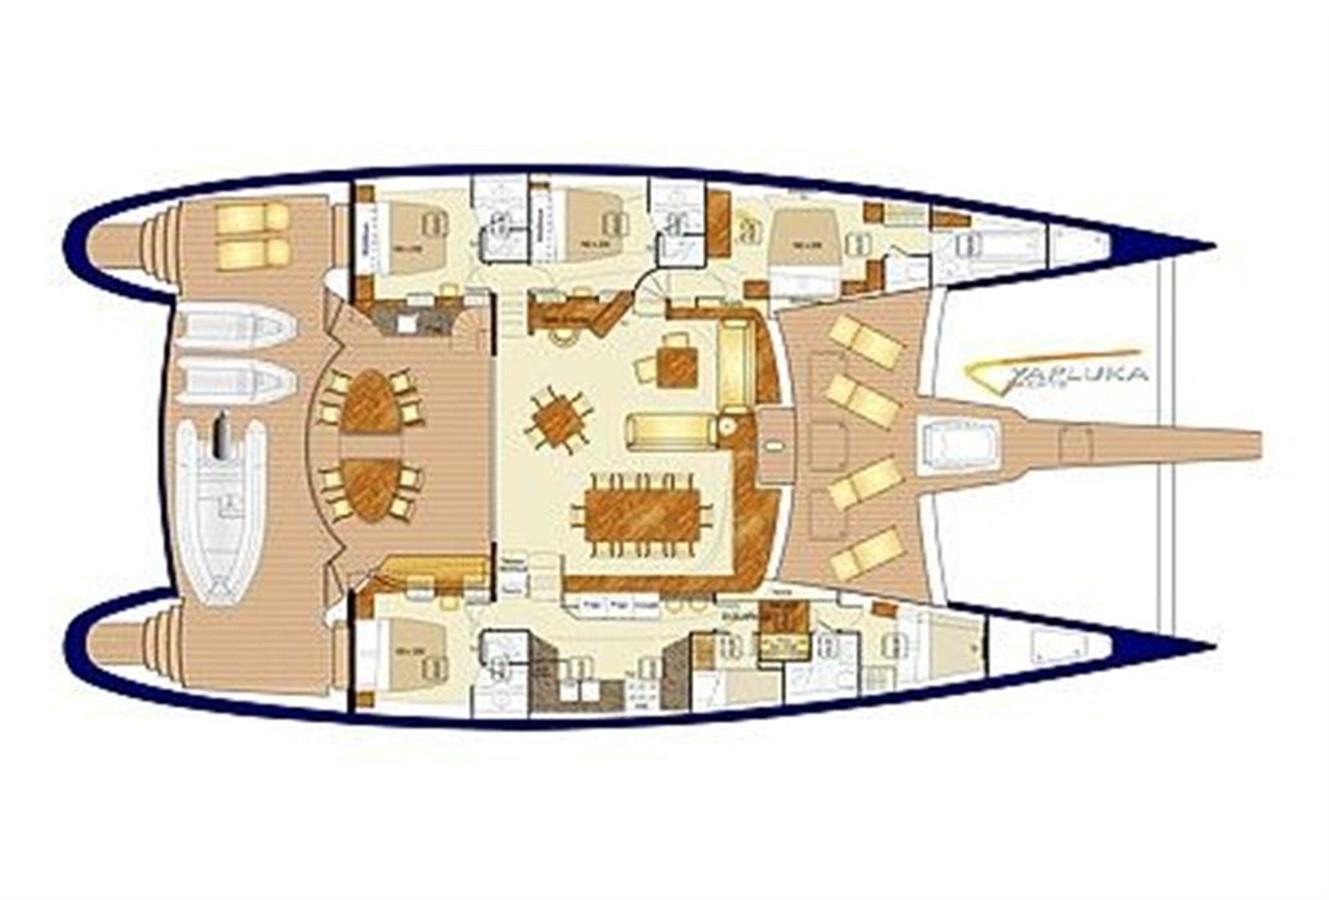 Single Deck Layout 2008 YAPLUKA 85 Double Deck Catamaran 86948